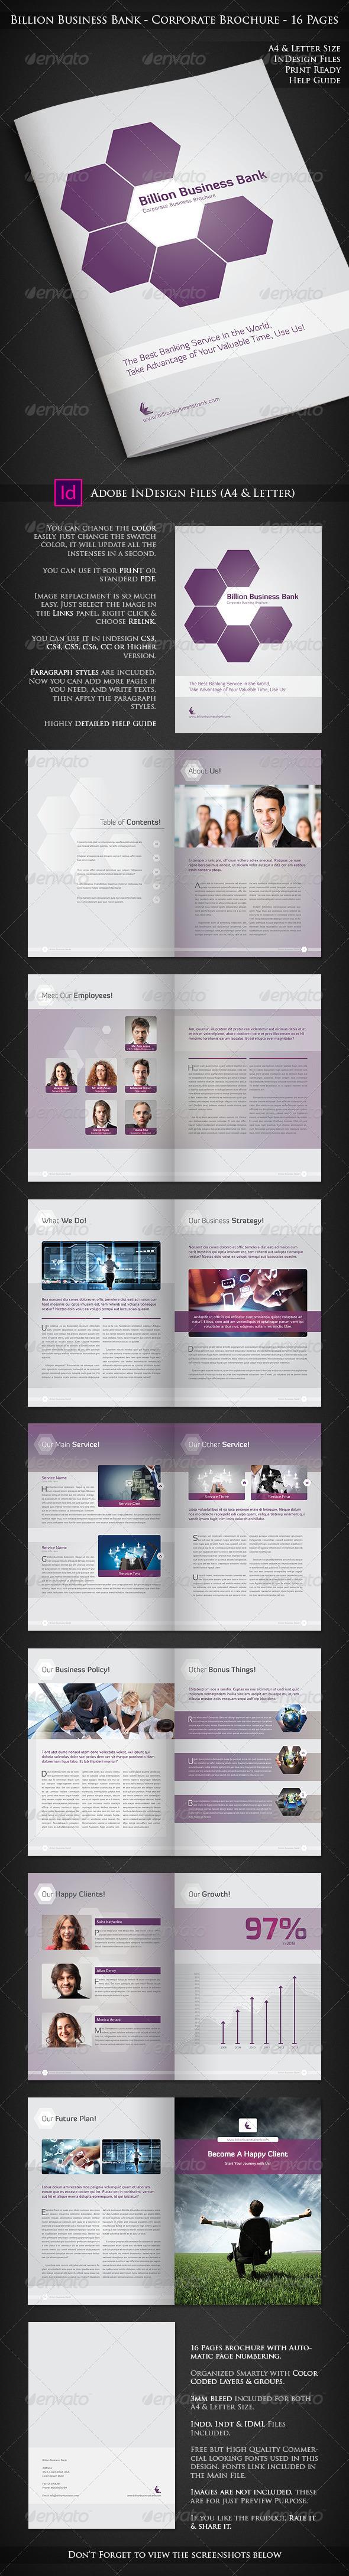 GraphicRiver Billion Business Bank 16 Pages Brochure 7700628